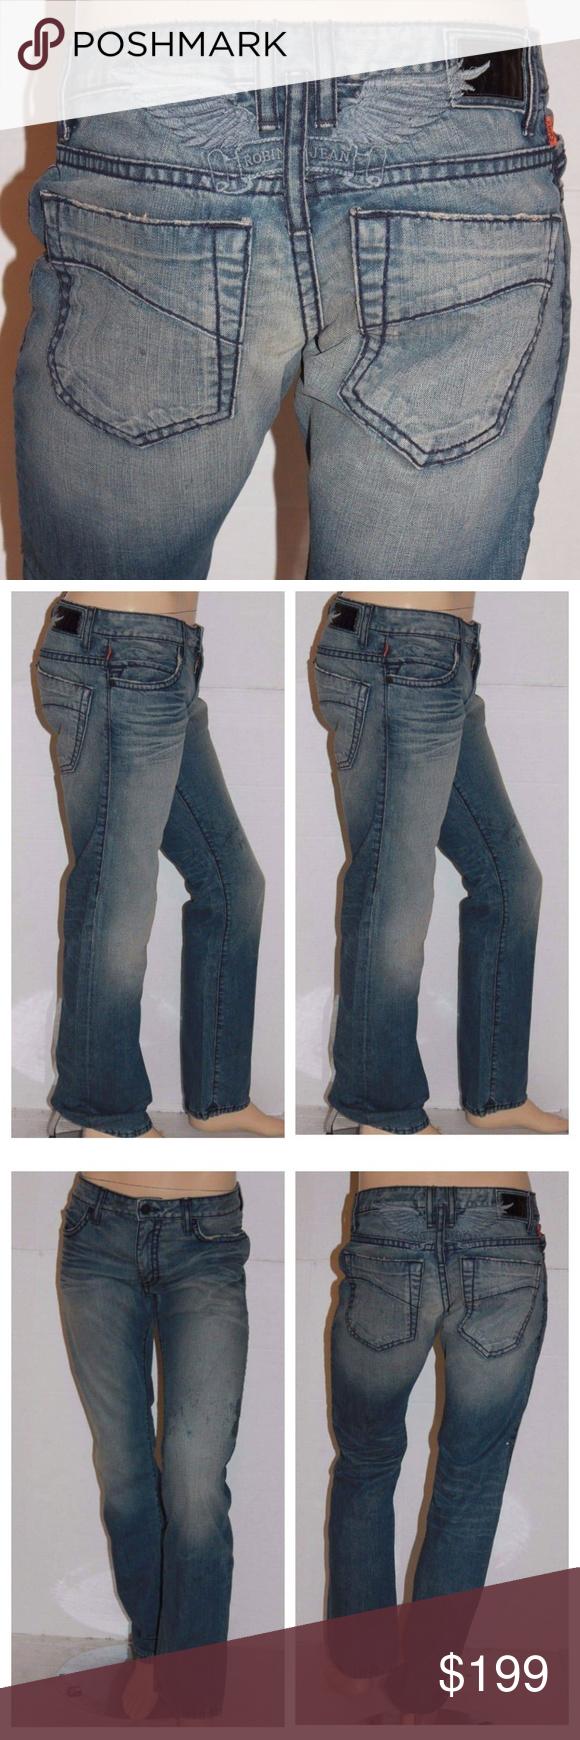 MARLON Straight Leg Jeans GREEN New Men/'s ROBIN/'S JEAN